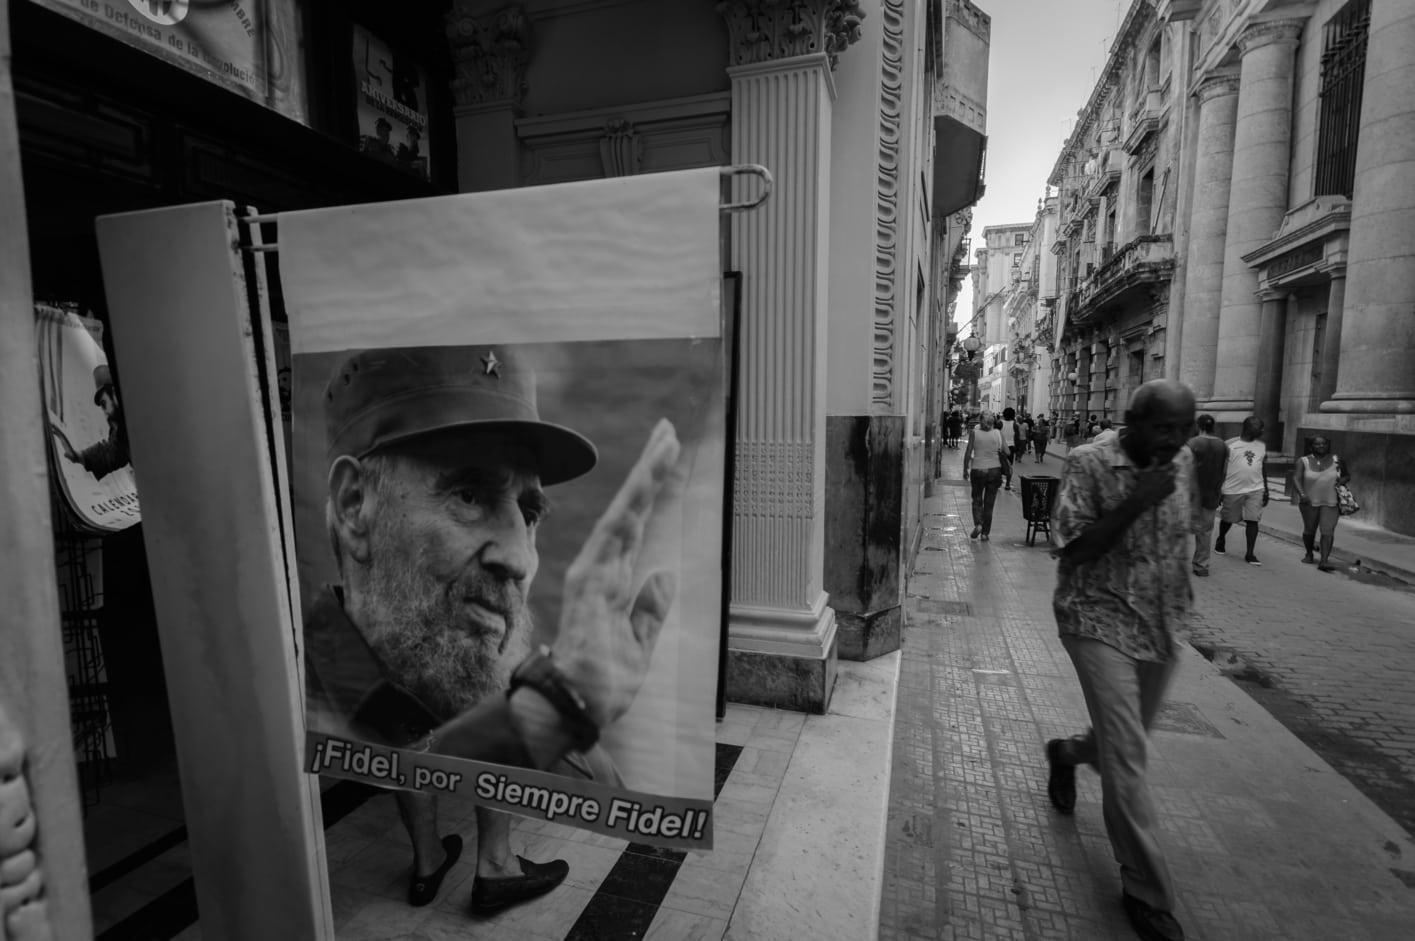 habana vieja cartel fidel blanco y negro fotografia la habana cuba. Guia de la Habana.